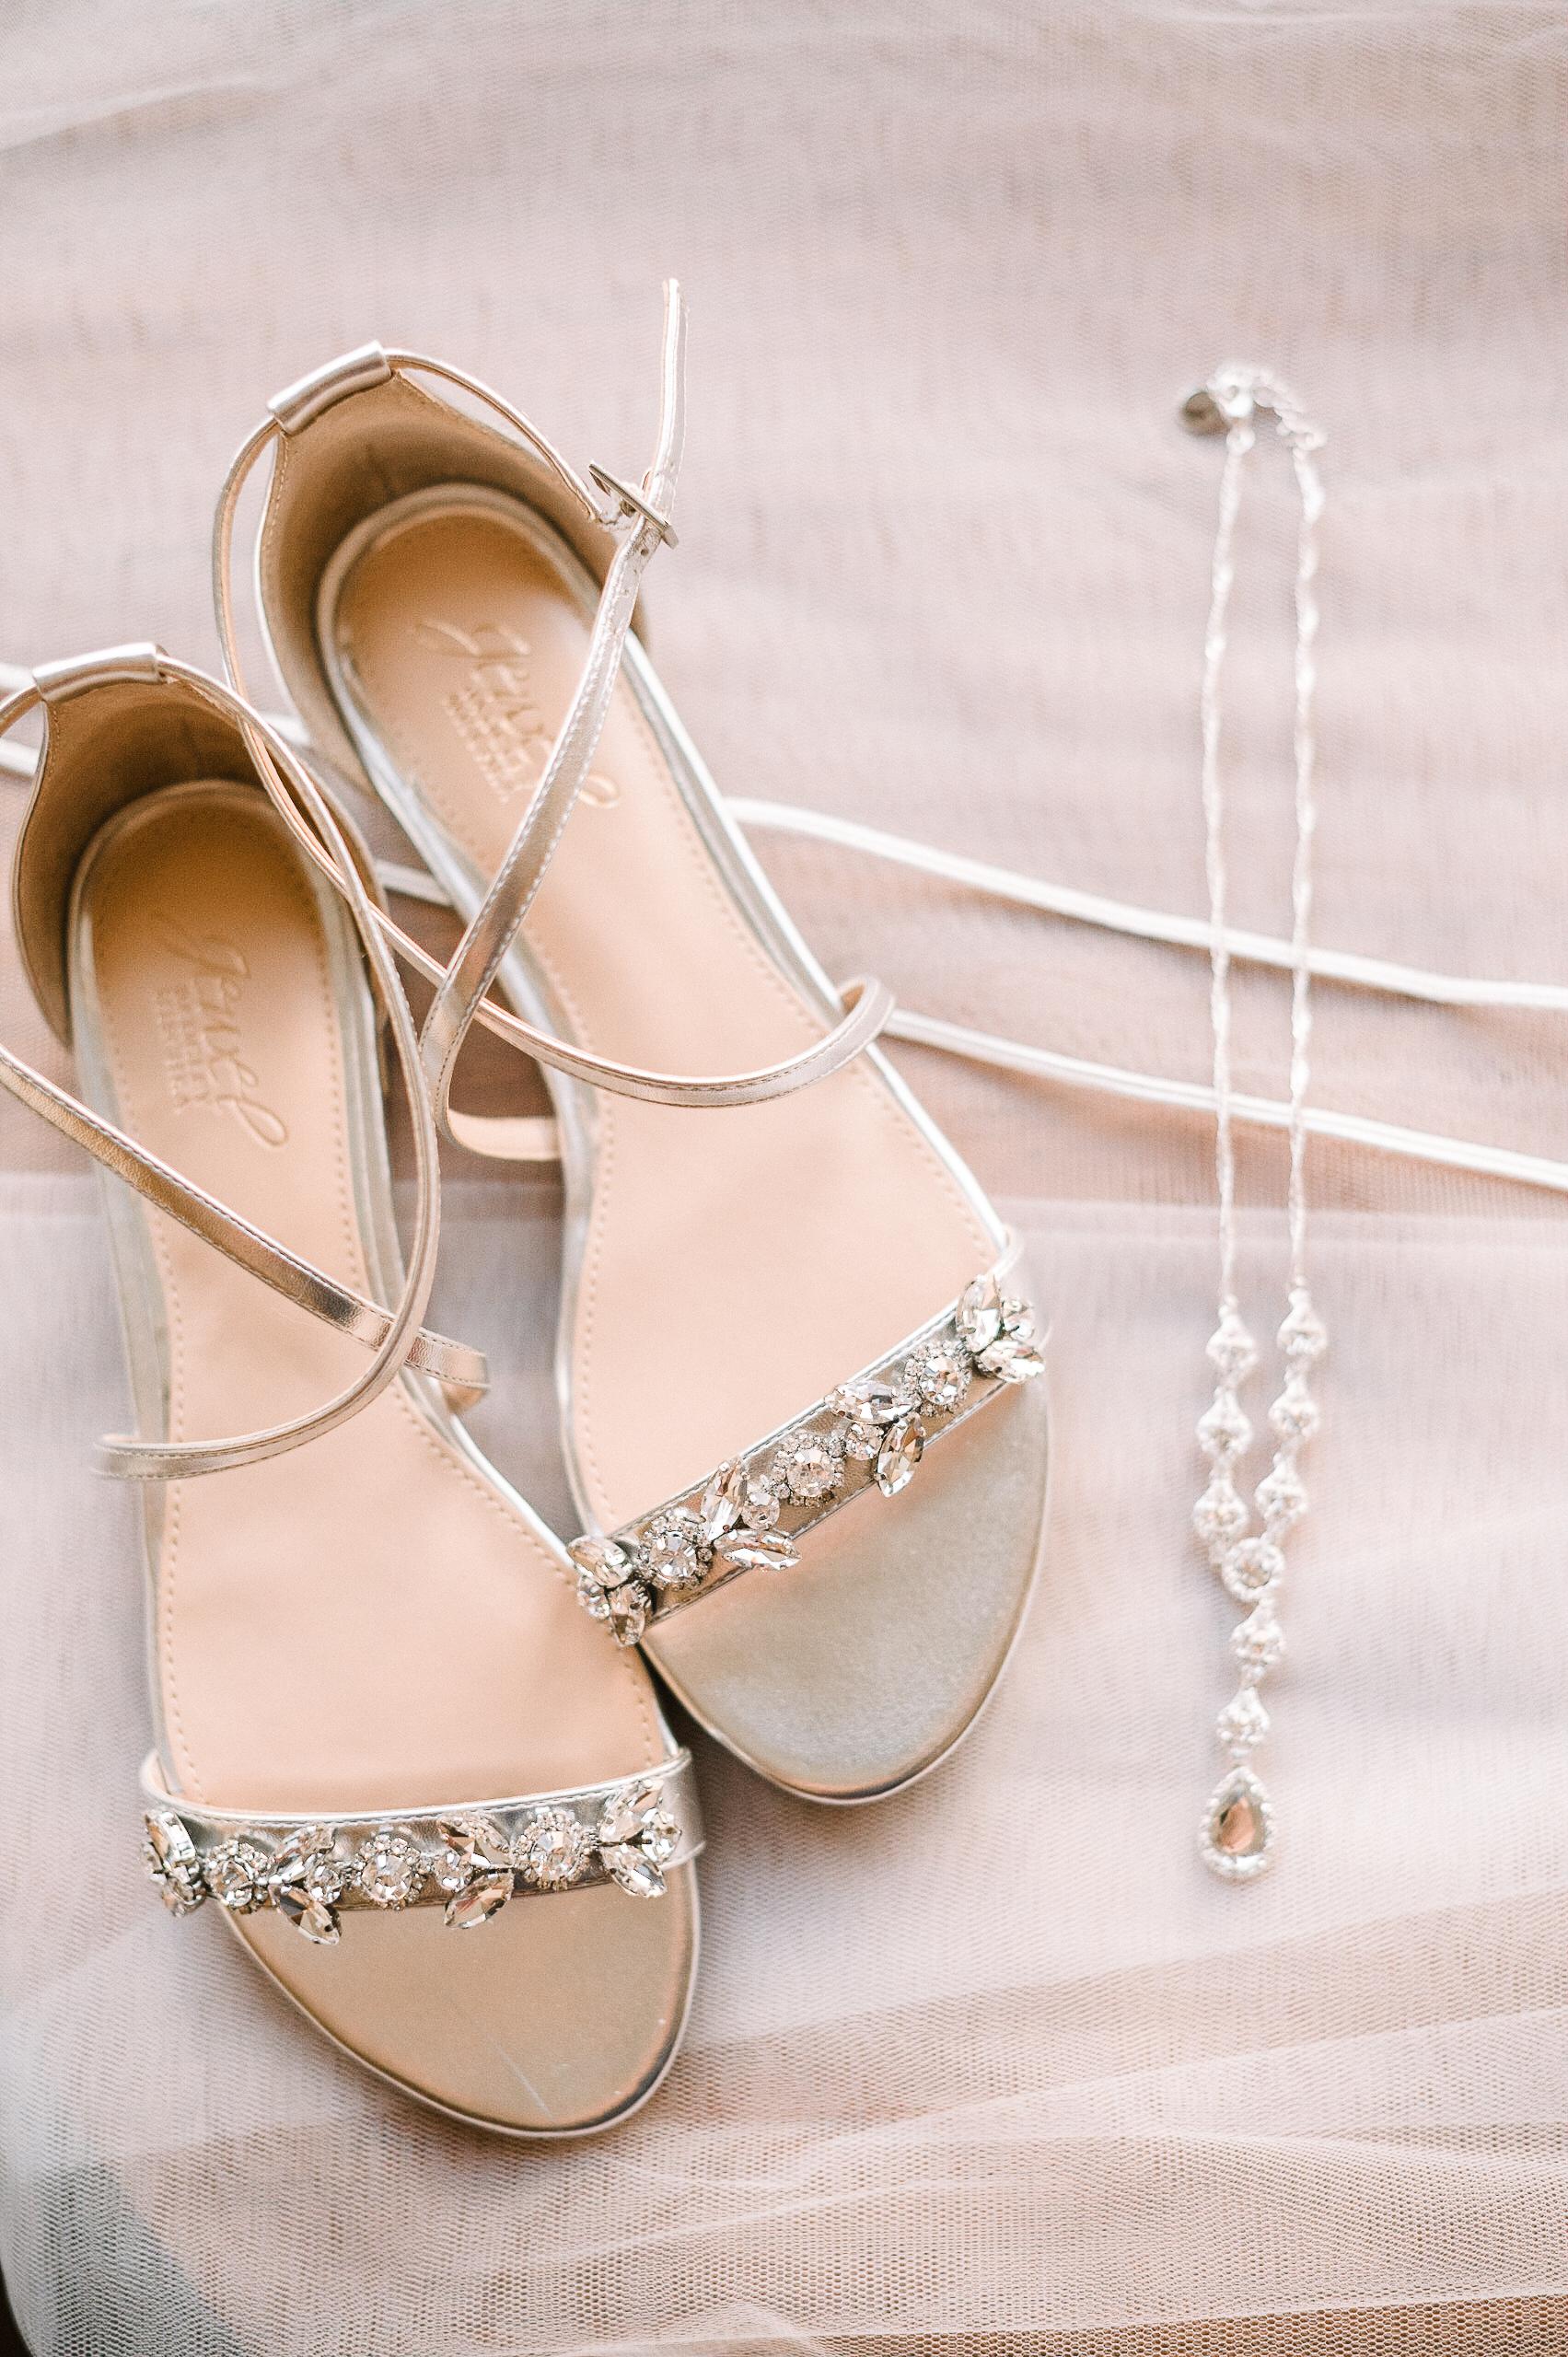 Detail shot of Bride's Wedding Shoes at The Park Hyatt Hotel in Washington DC